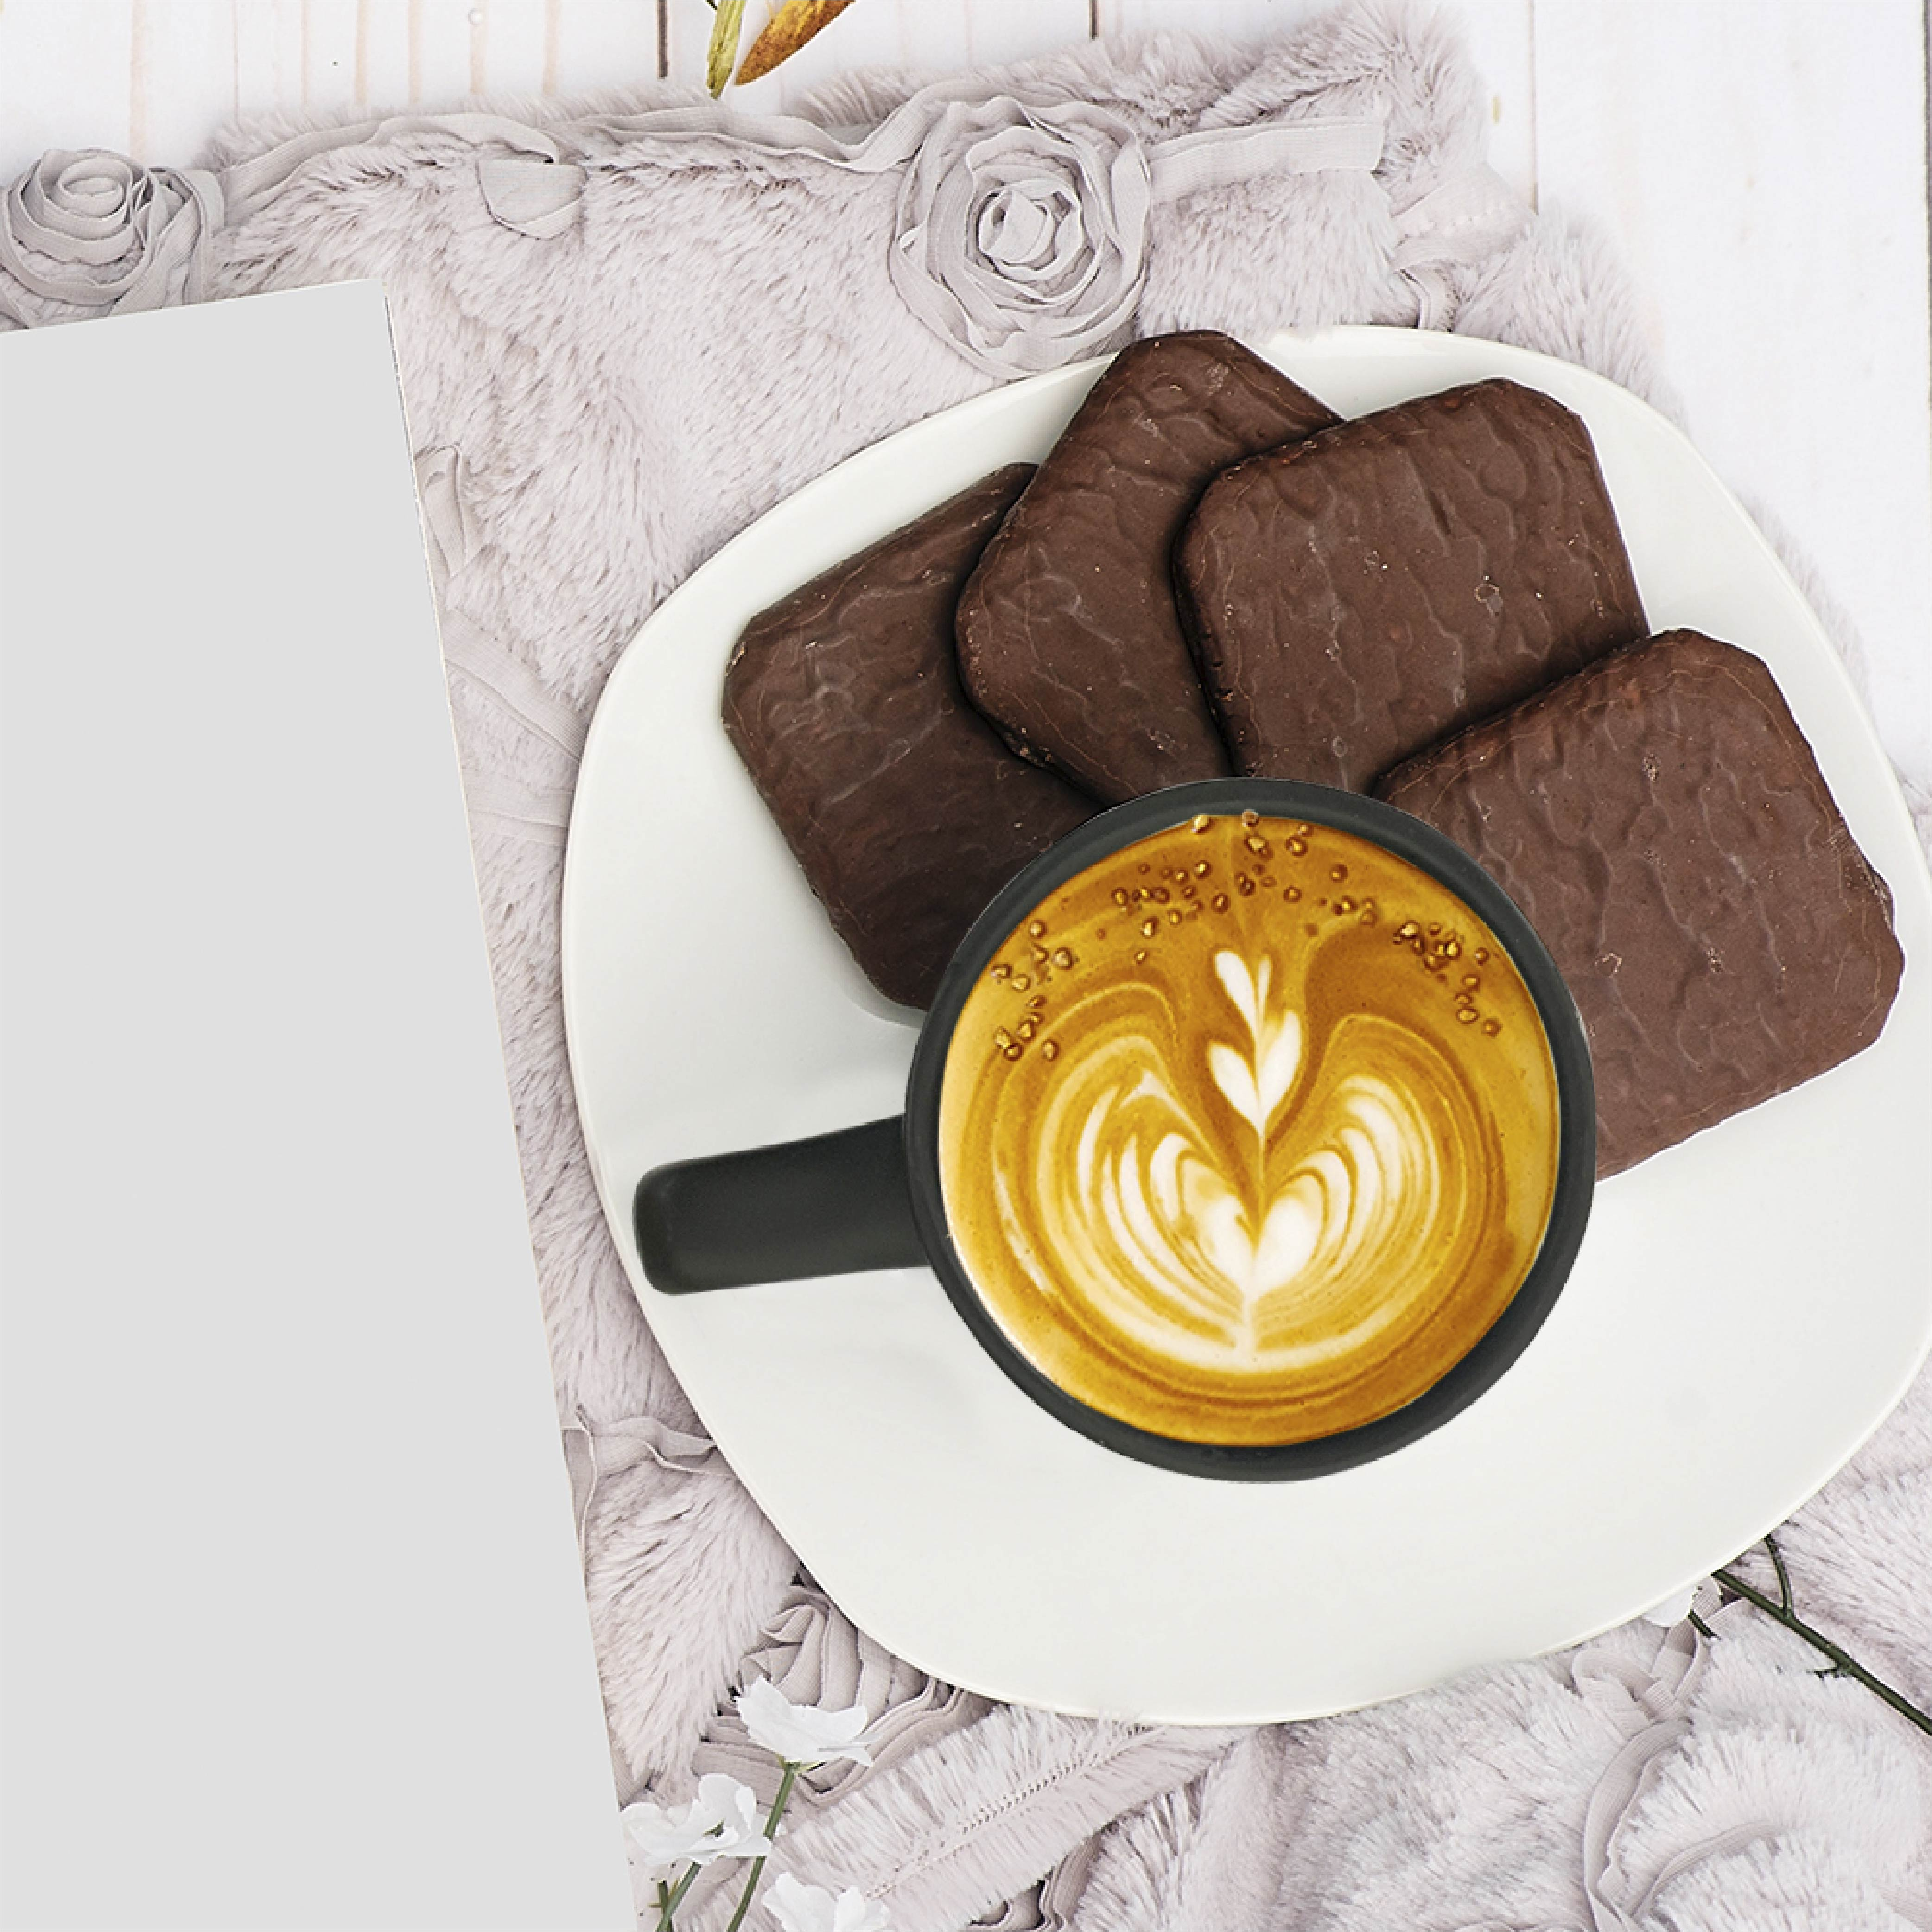 Harry Potter 15 oz. Coffee Mug, The Sorcerer's Stone slideshow image 14